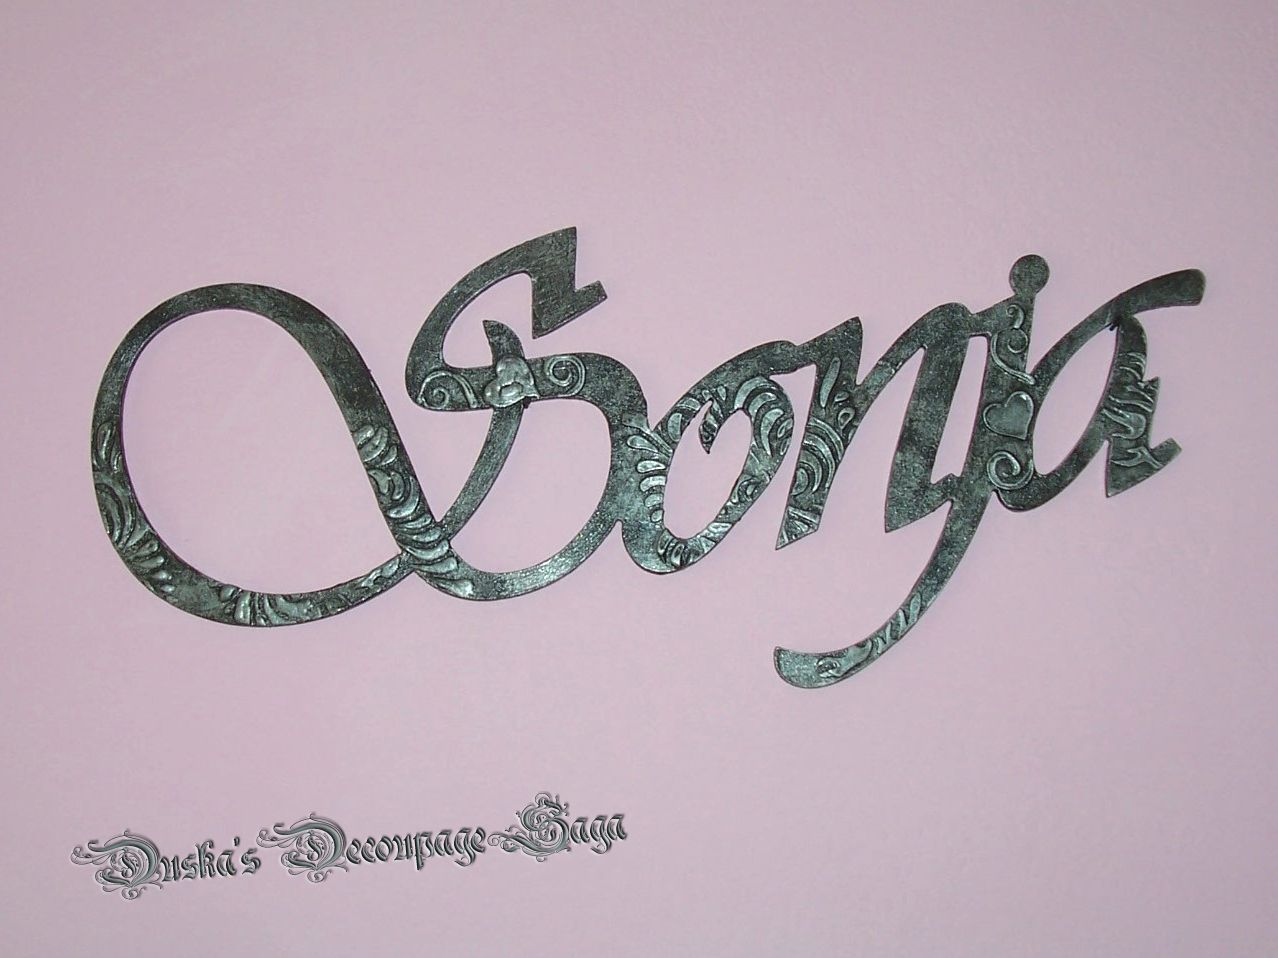 Duska's Decoupage Saga Wall Decor Letters